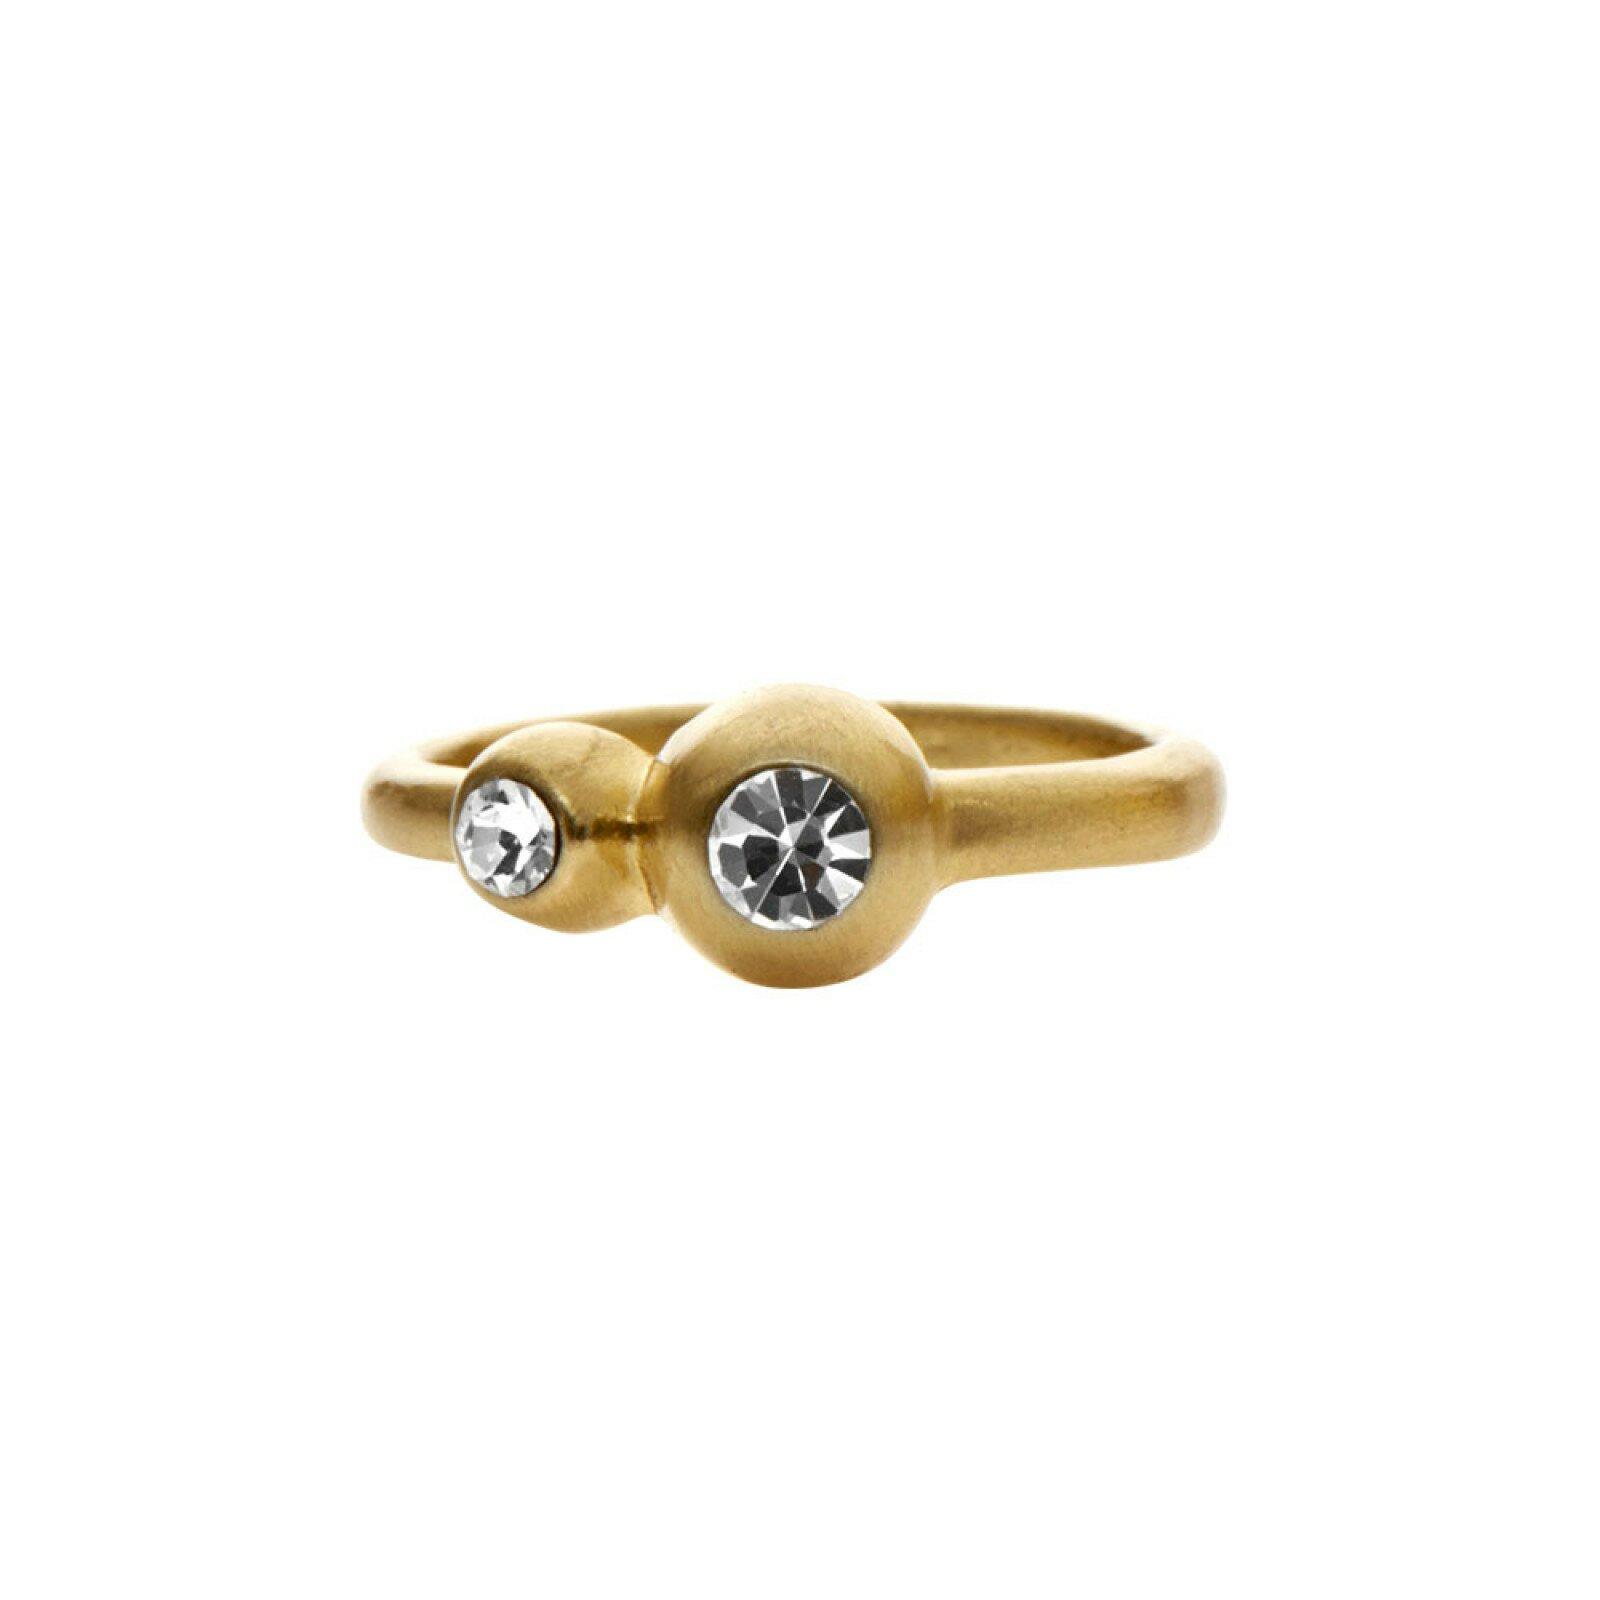 Guld ring med dobbelt krystal